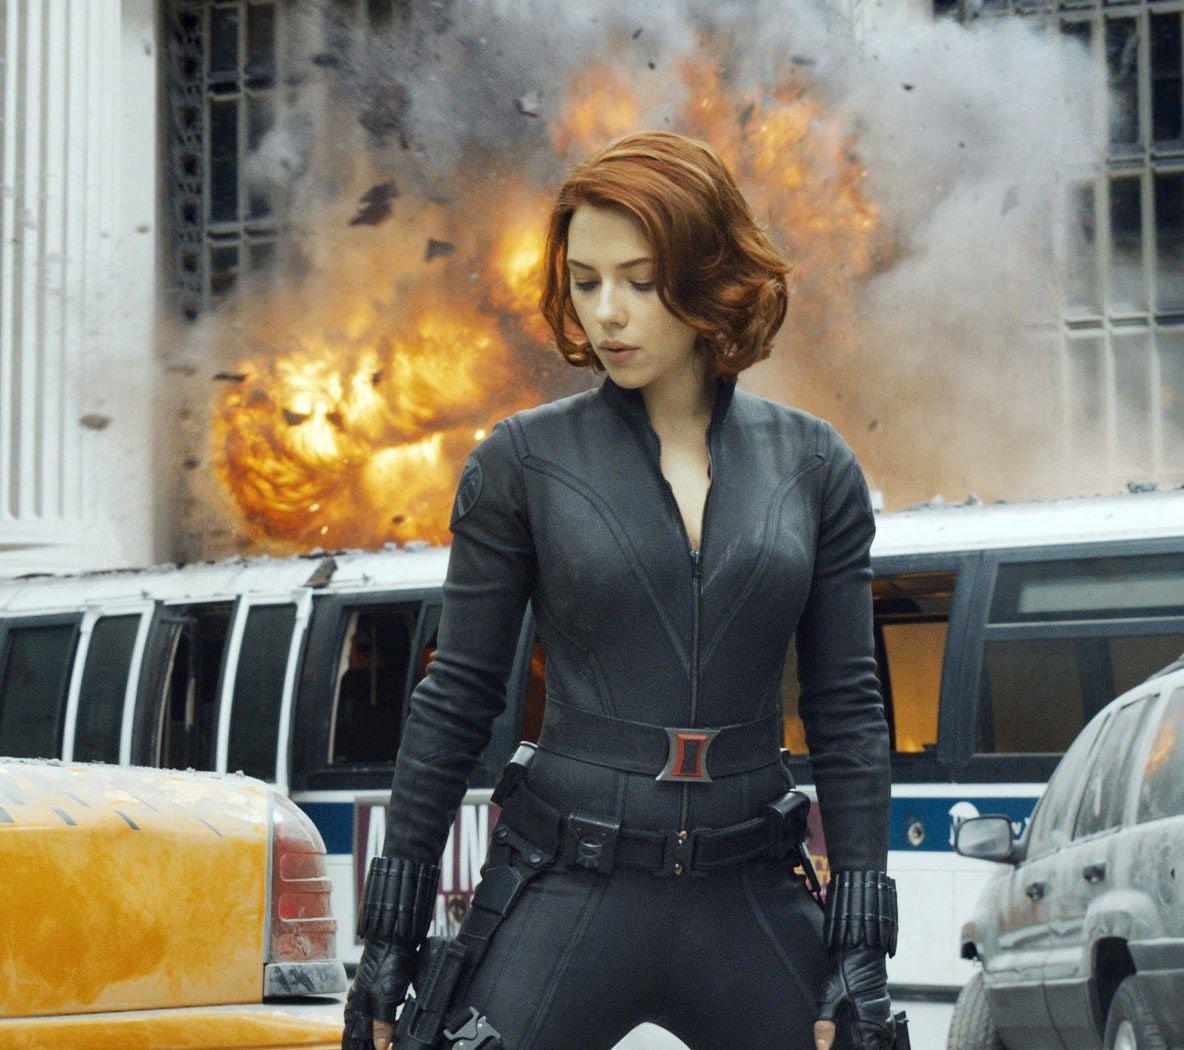 Disney claps back against Scarlett Johansson's 'Black Widow' streaming lawsuit